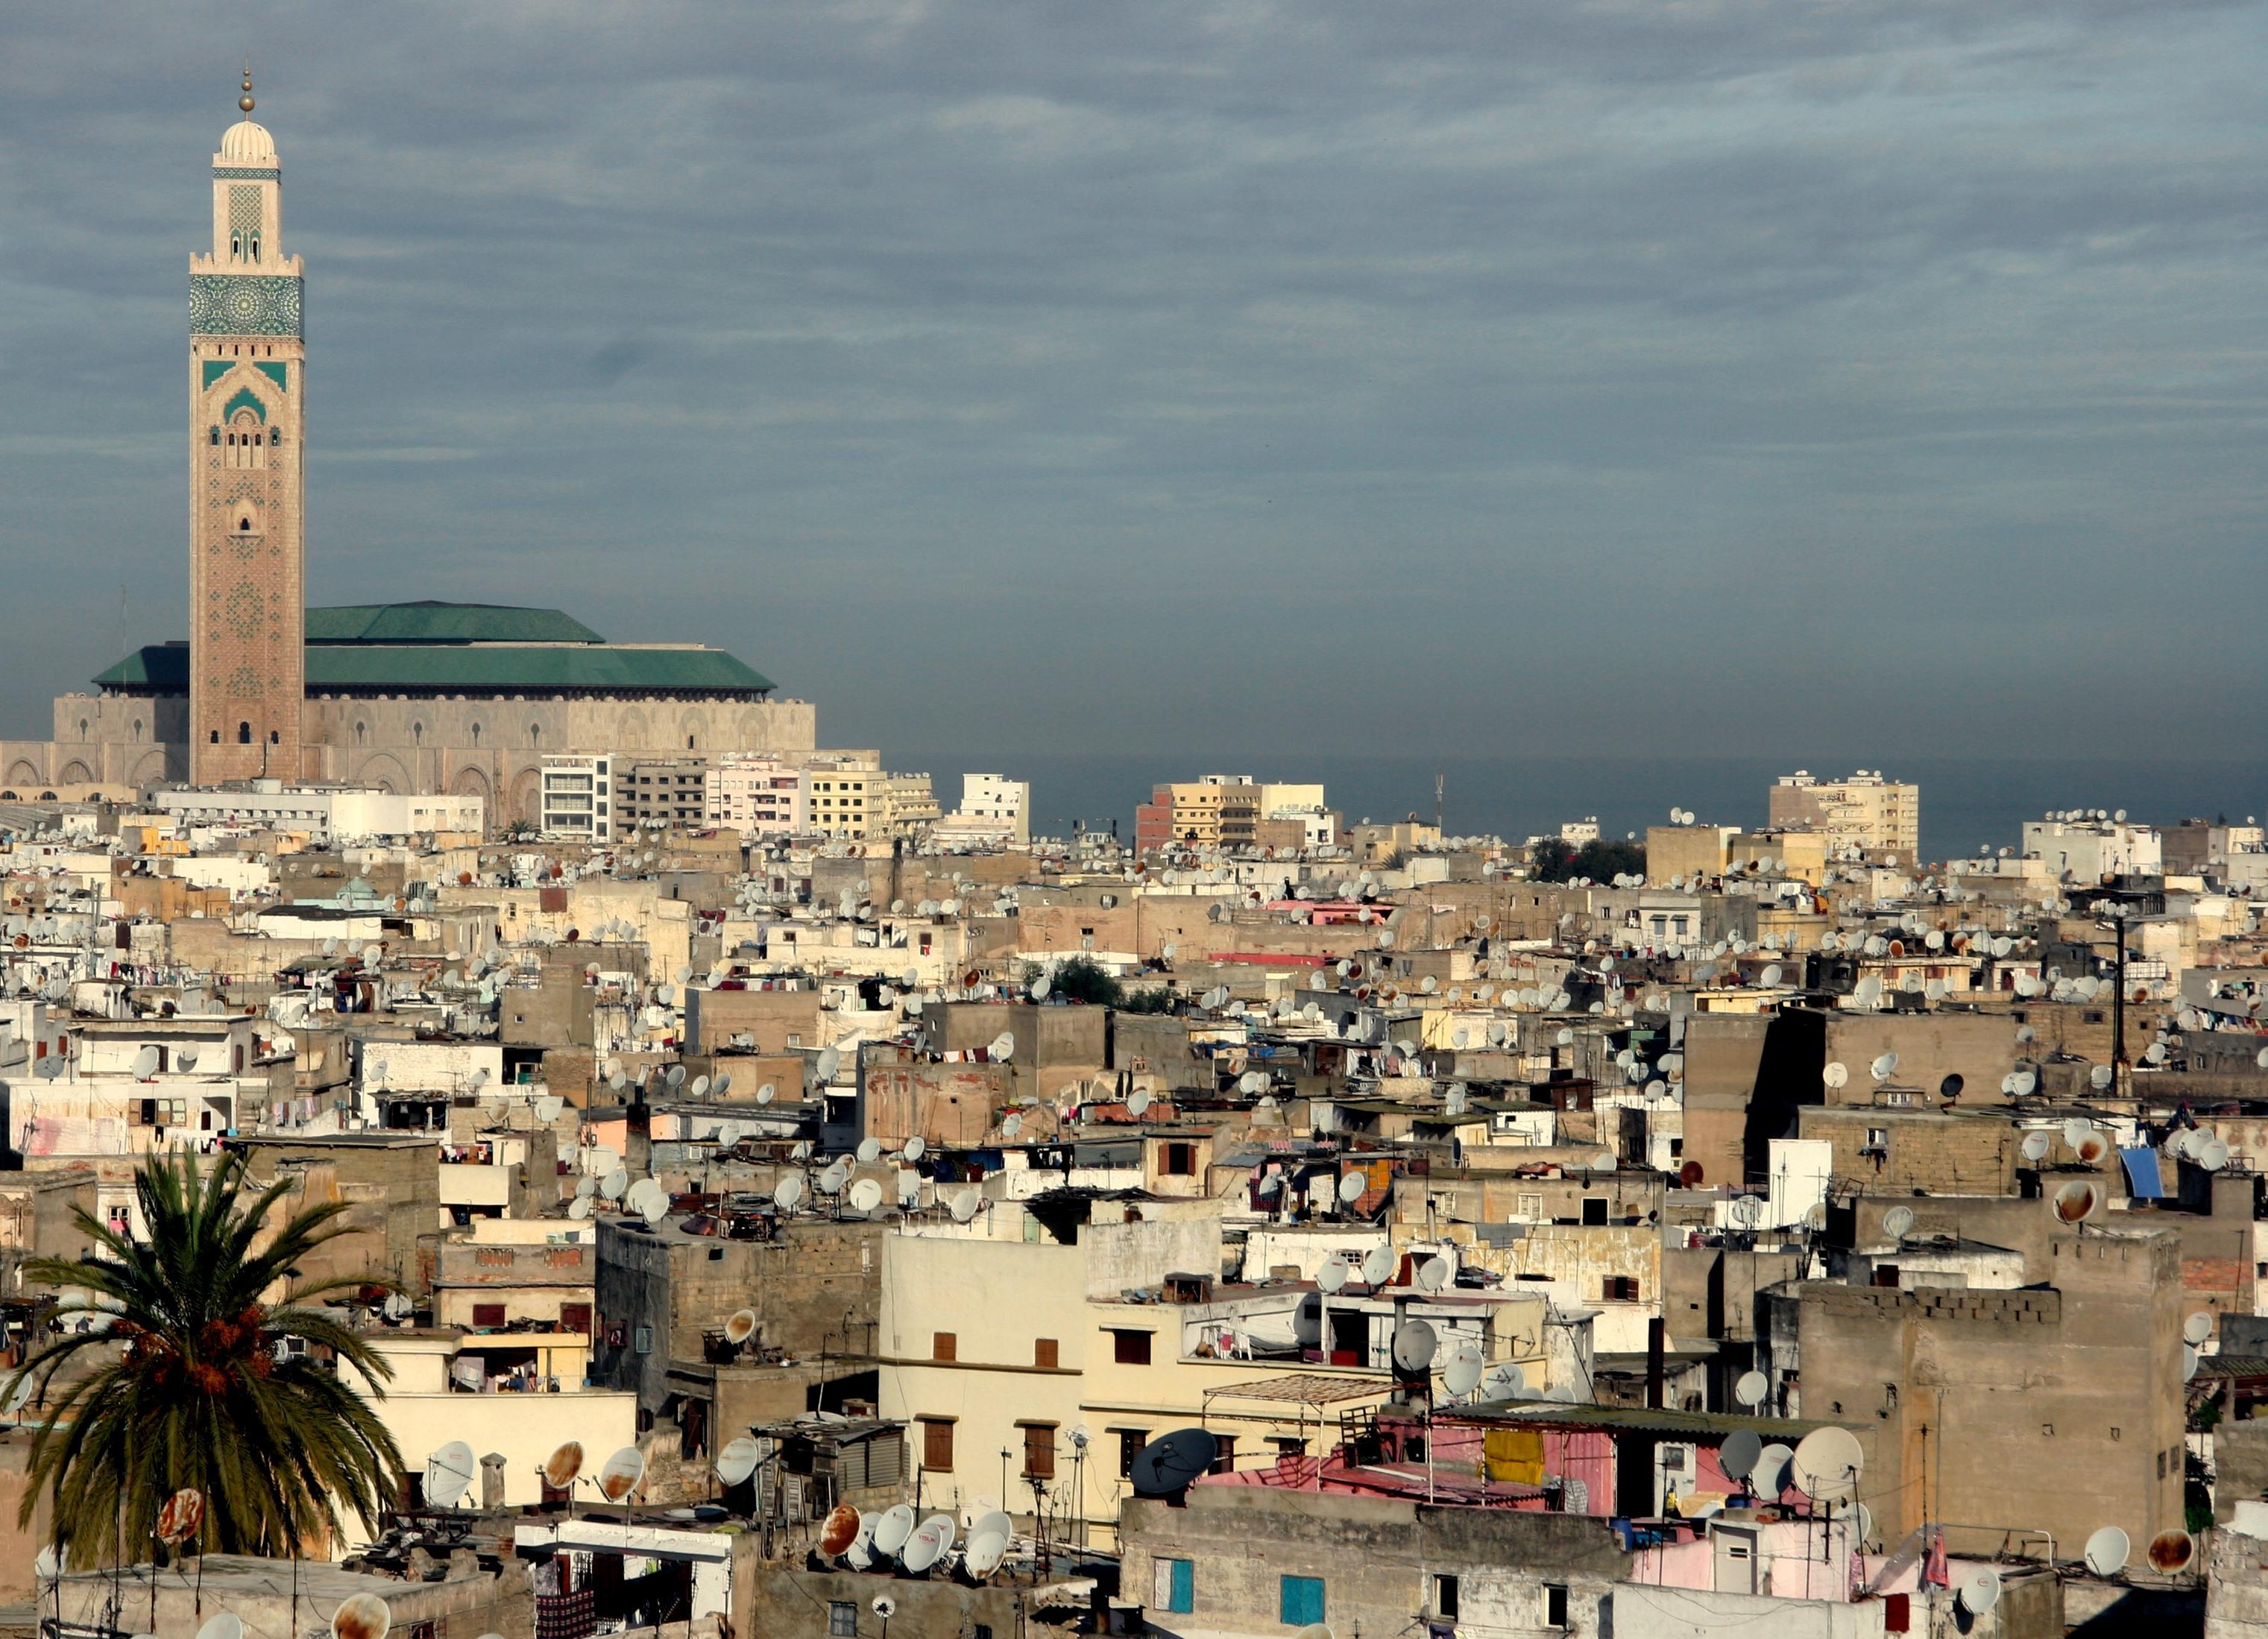 Касабланка, Марокко - достопримечательности